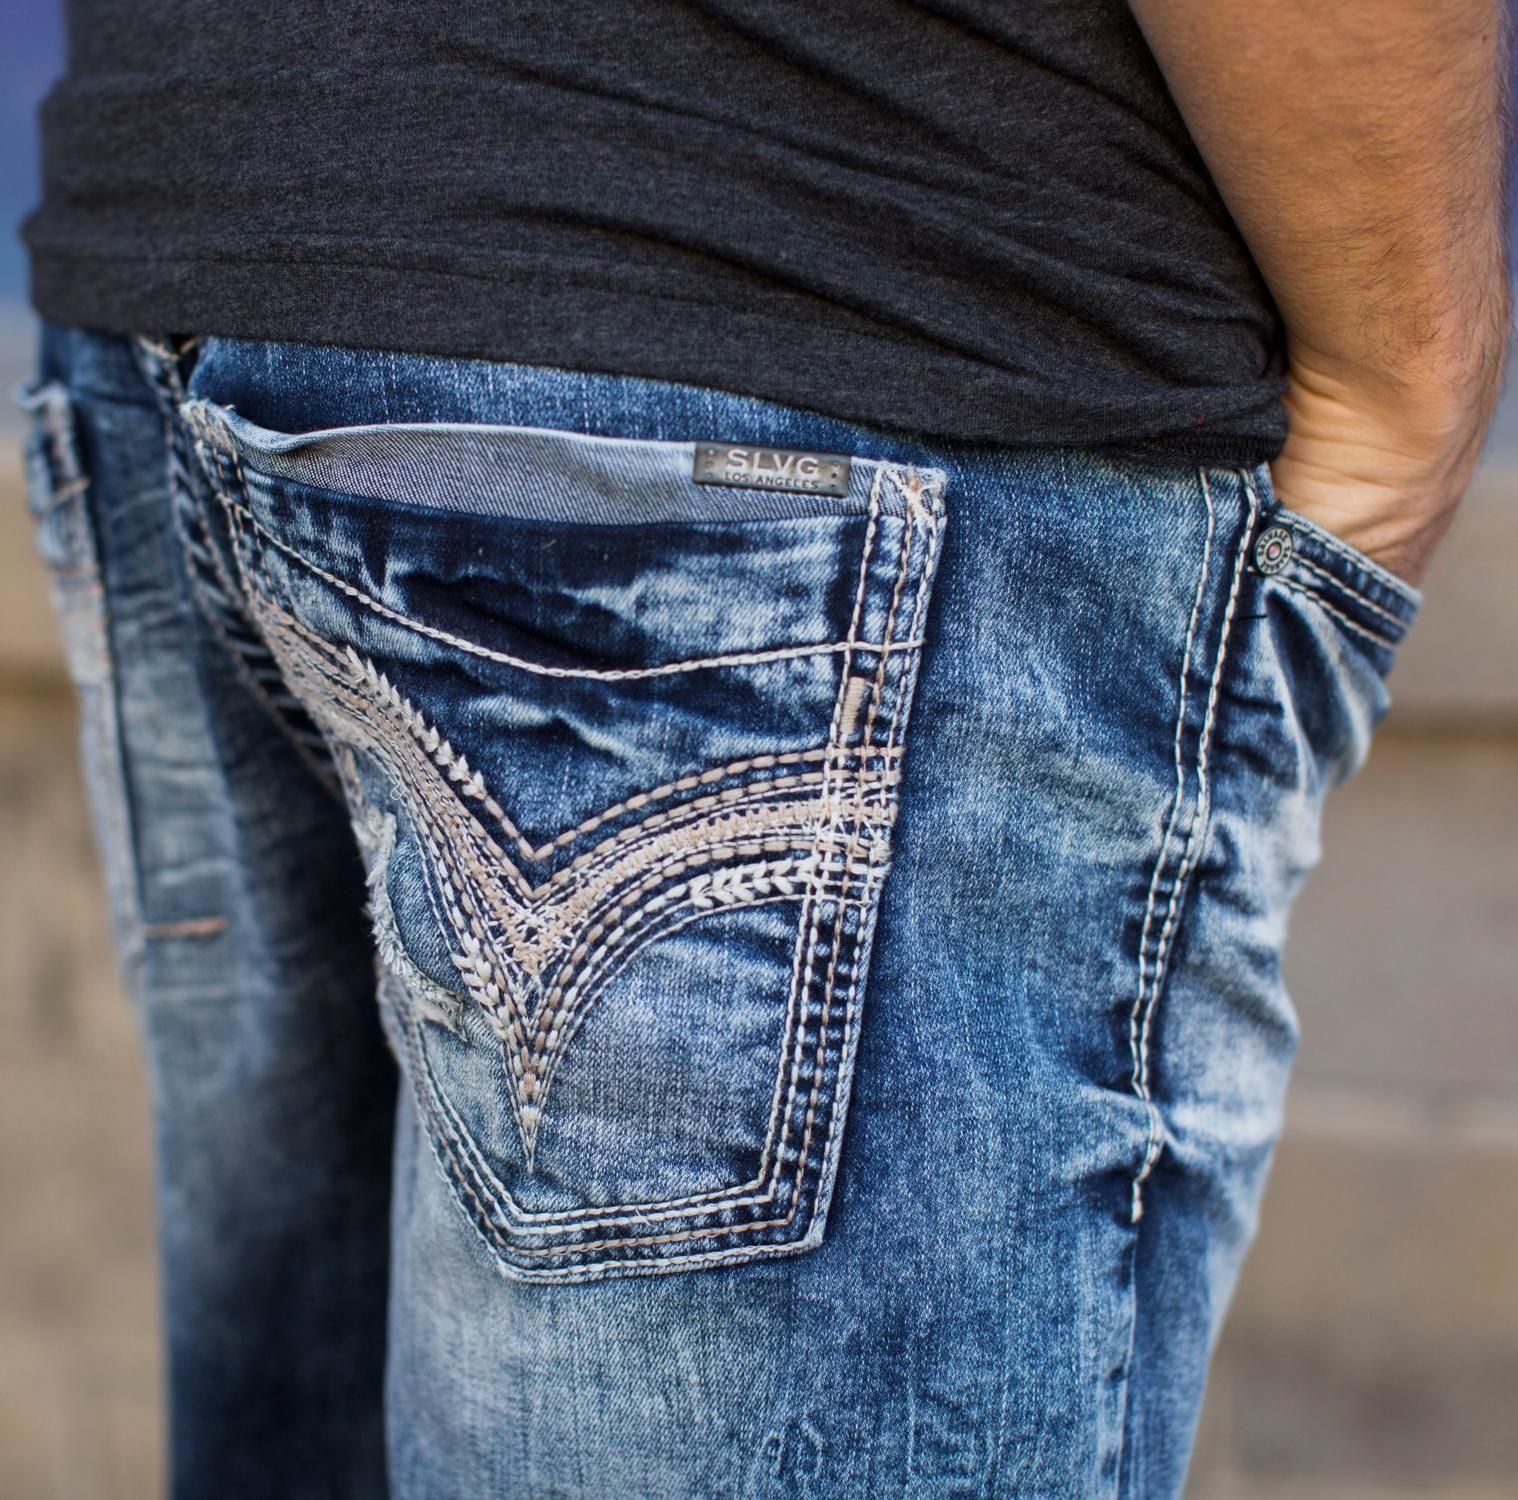 Salvage Mayhem Straight Jean - Men' Jeans Buckle